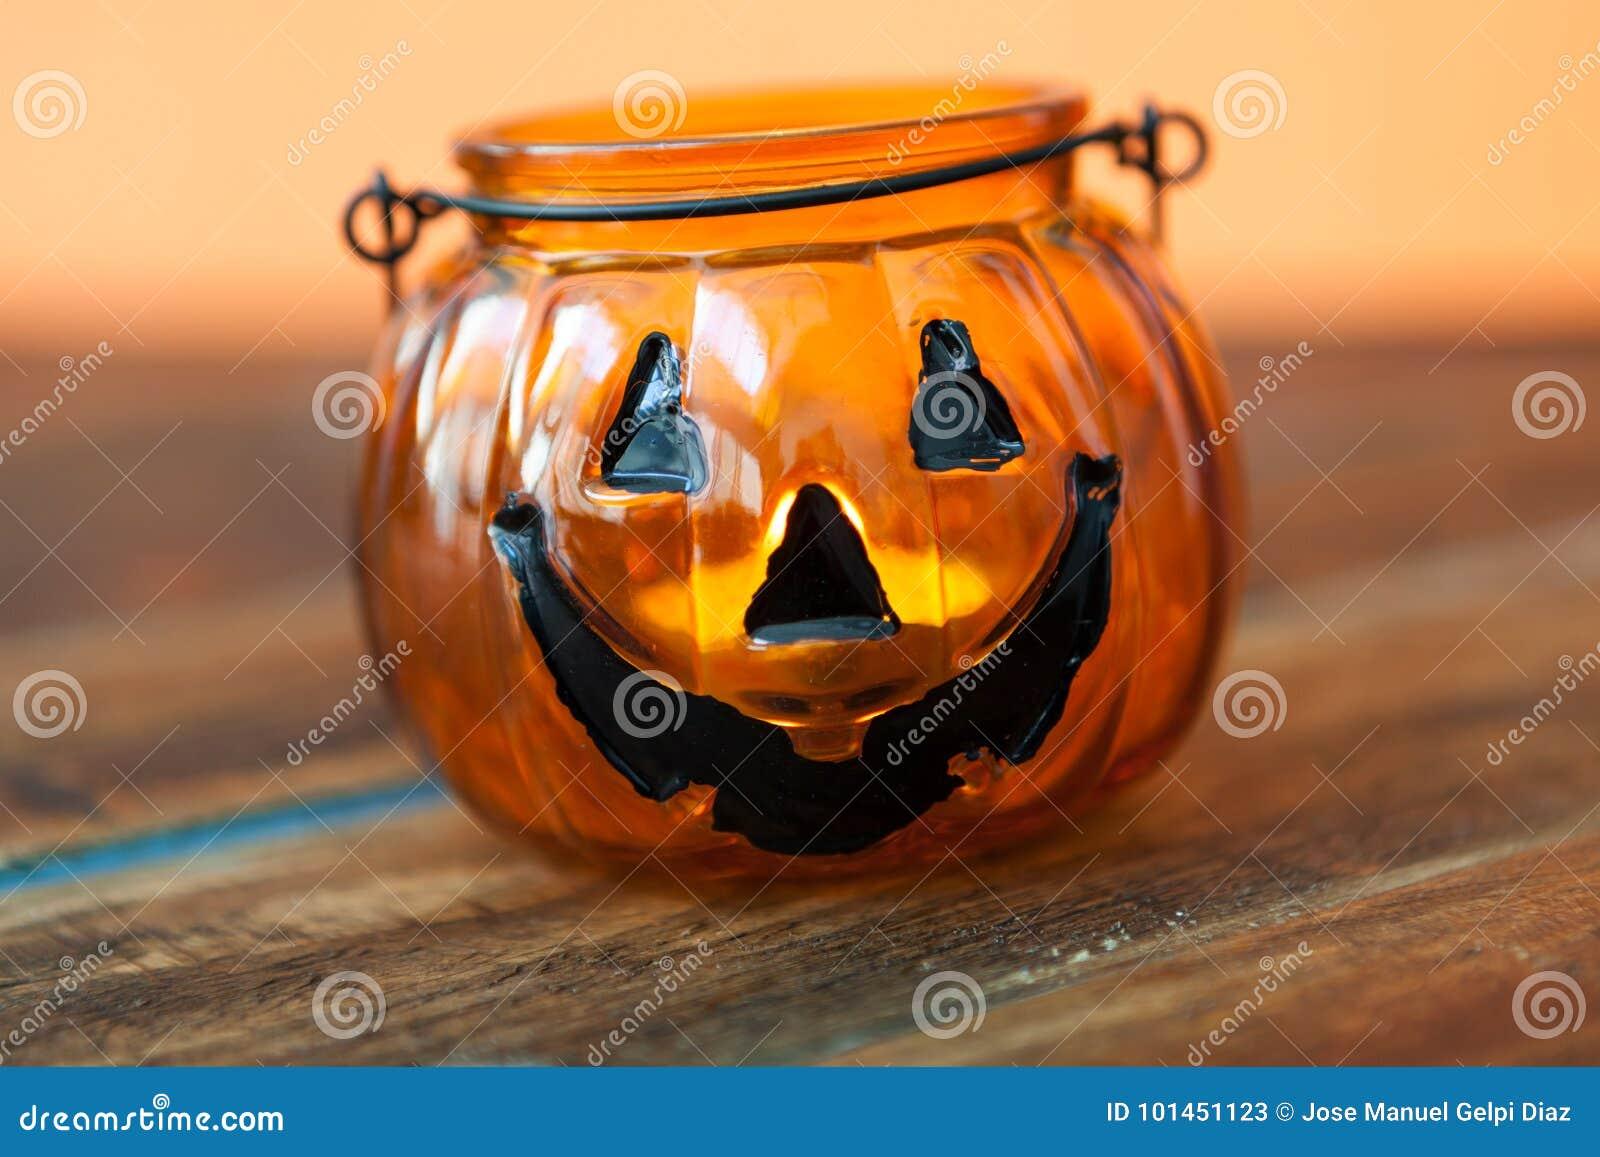 Decoration for Halloween